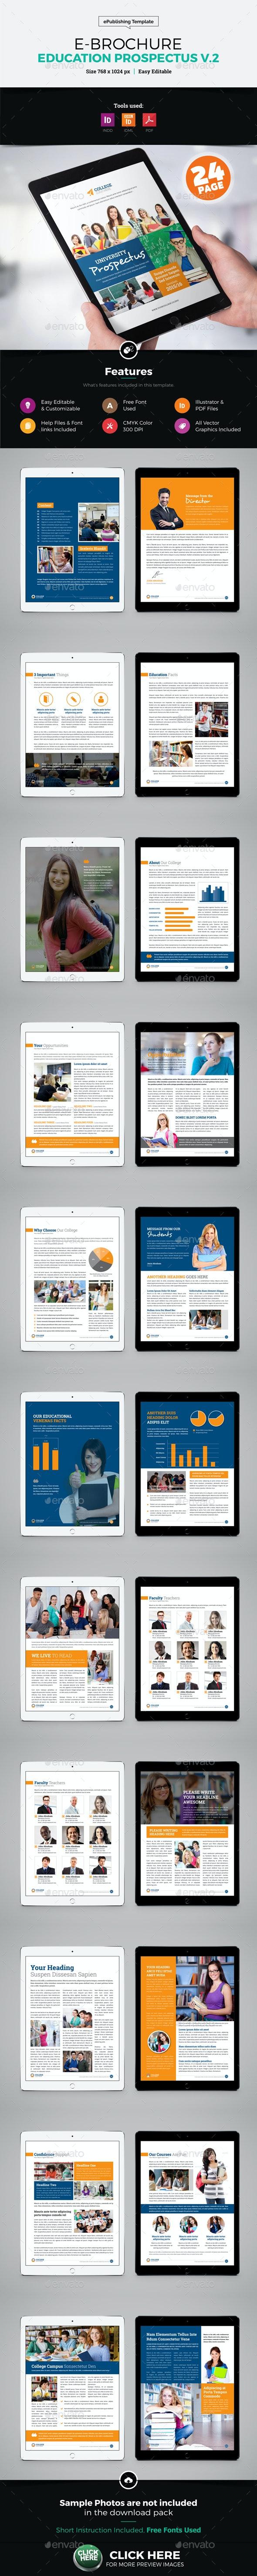 E-Brochure University Prospectus Design v2 - ePublishing